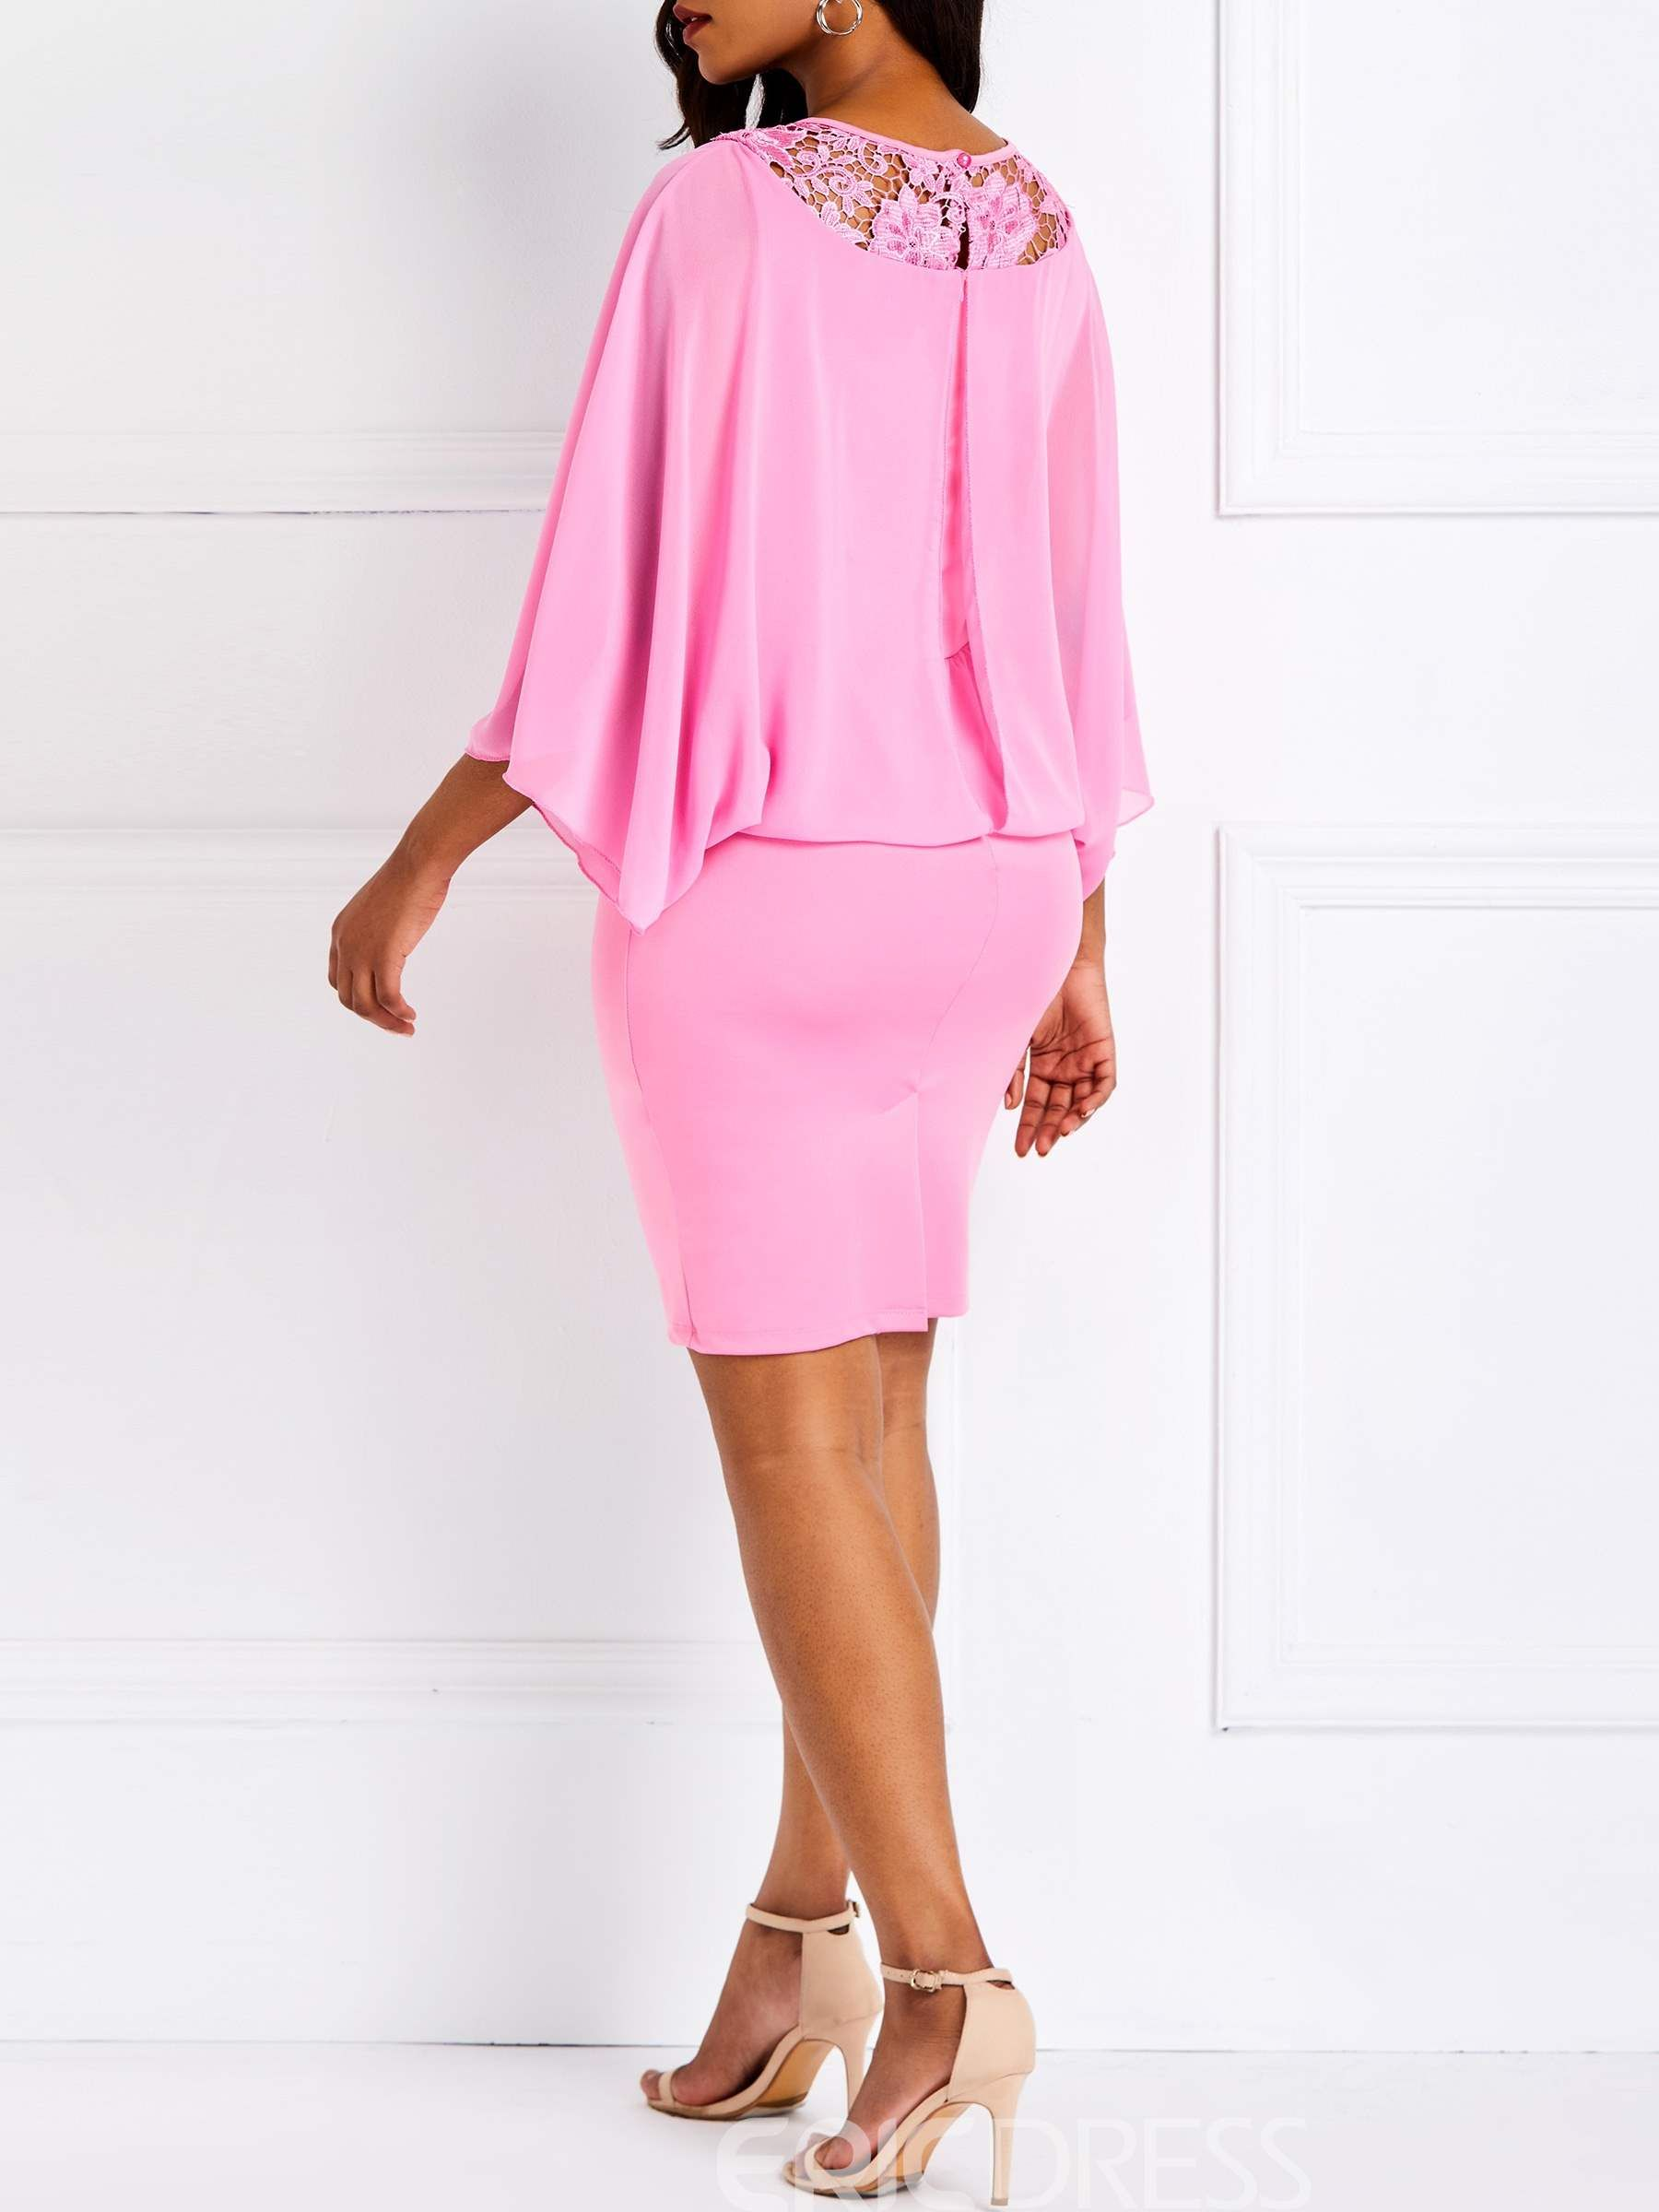 83626002fde Ericdress Knee-Length Lace Nine Points Sleeve Dress 13692364 - Ericdress.com